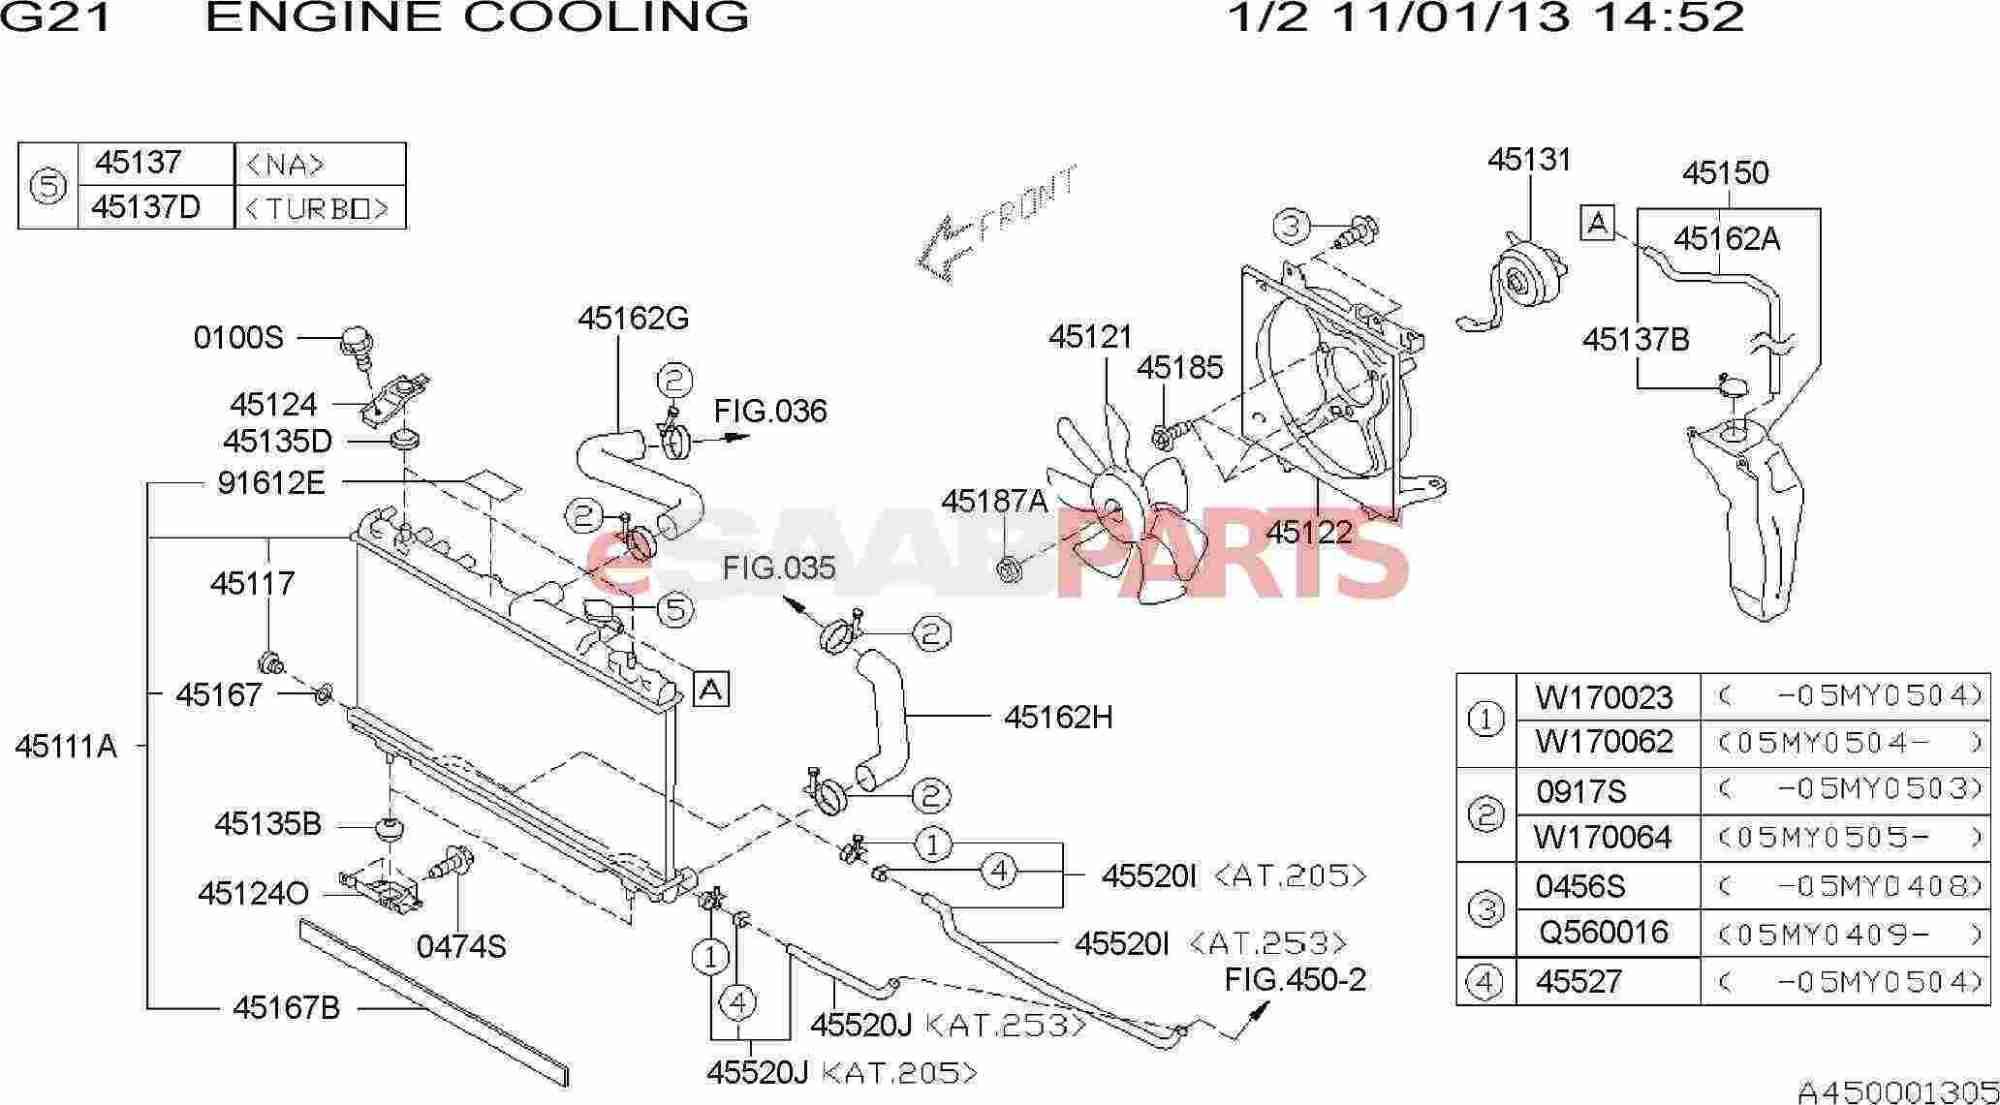 hight resolution of saab engine cooling diagram wiring diagram blogesaabparts com saab 9 2x u003e engine parts